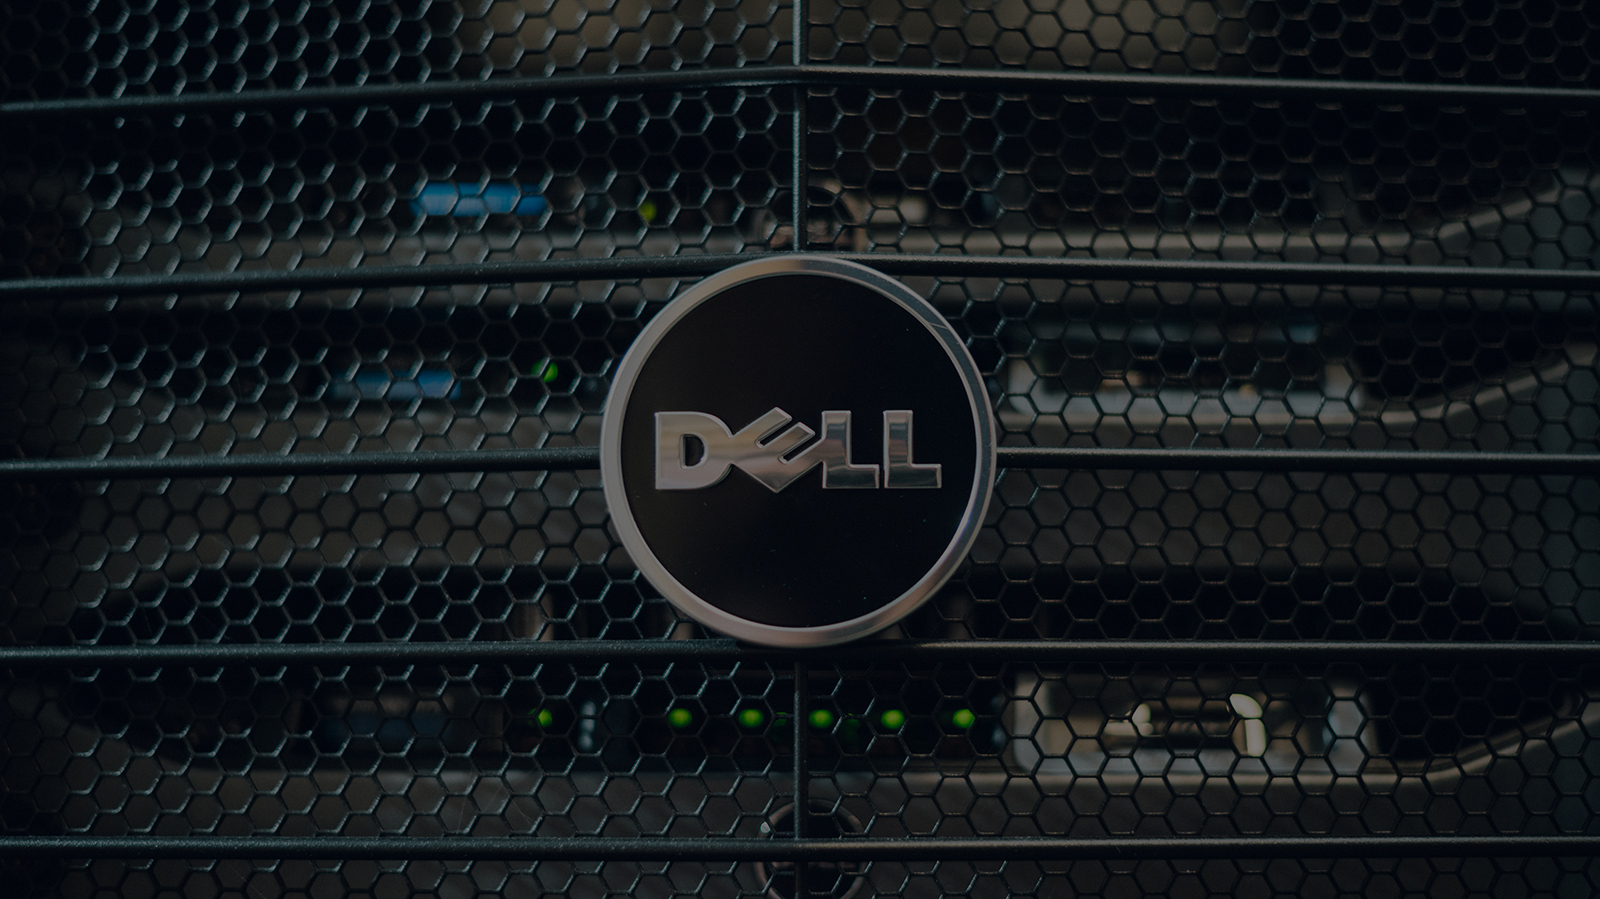 Dell Flash Storage